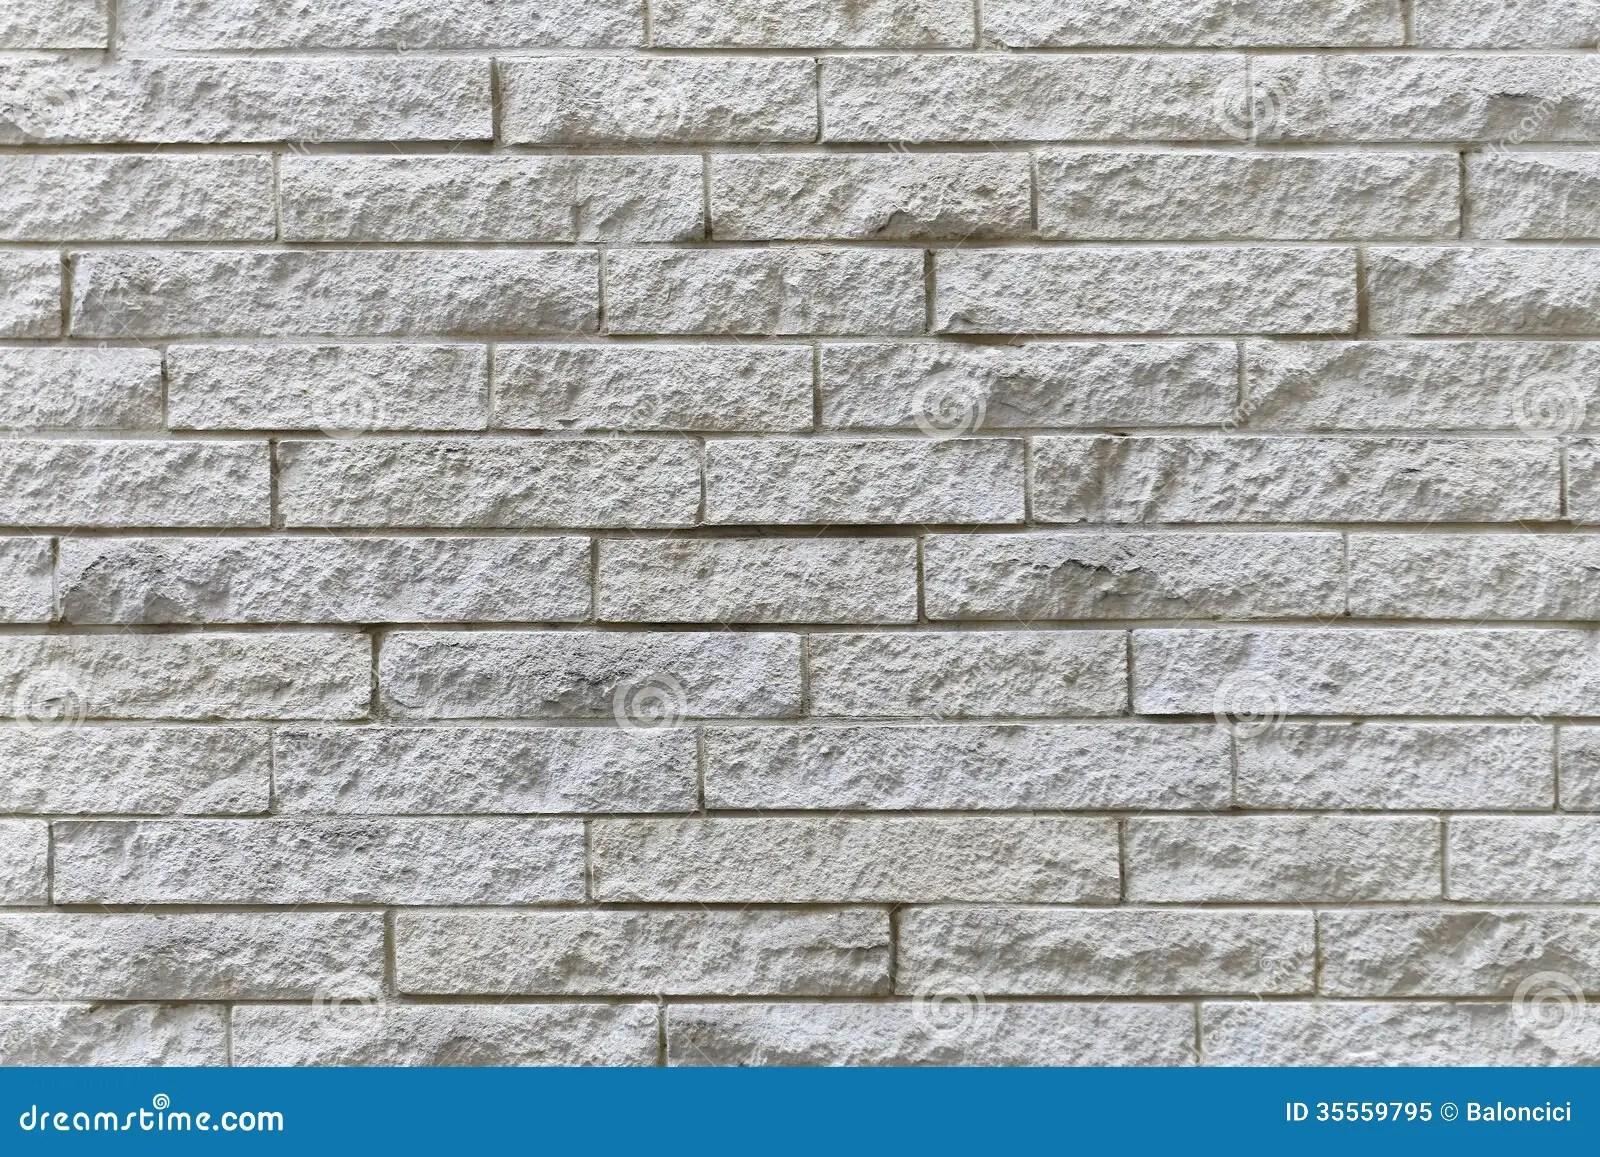 White Wall Royalty Free Stock Photo Image 35559795